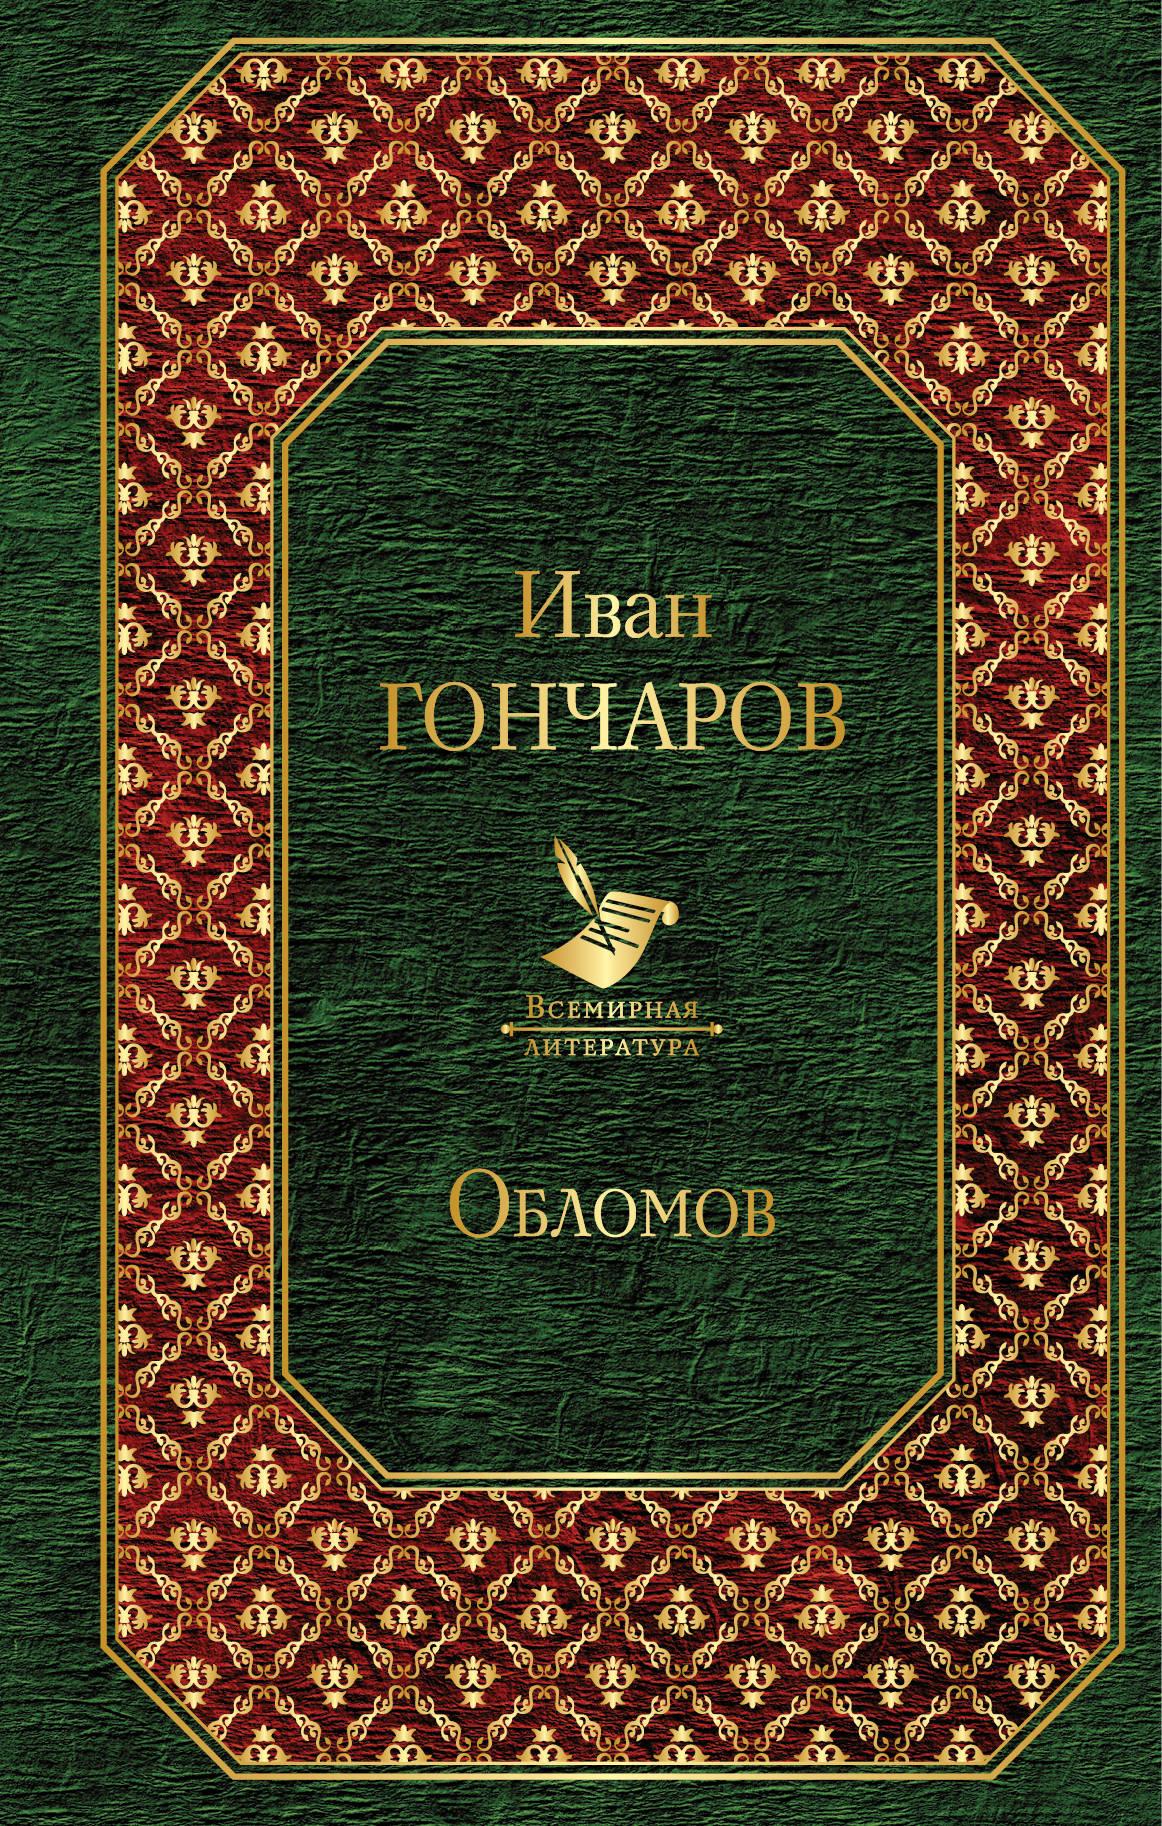 Гончаров Иван Александрович Обломов ISBN: 978-5-04-096895-4